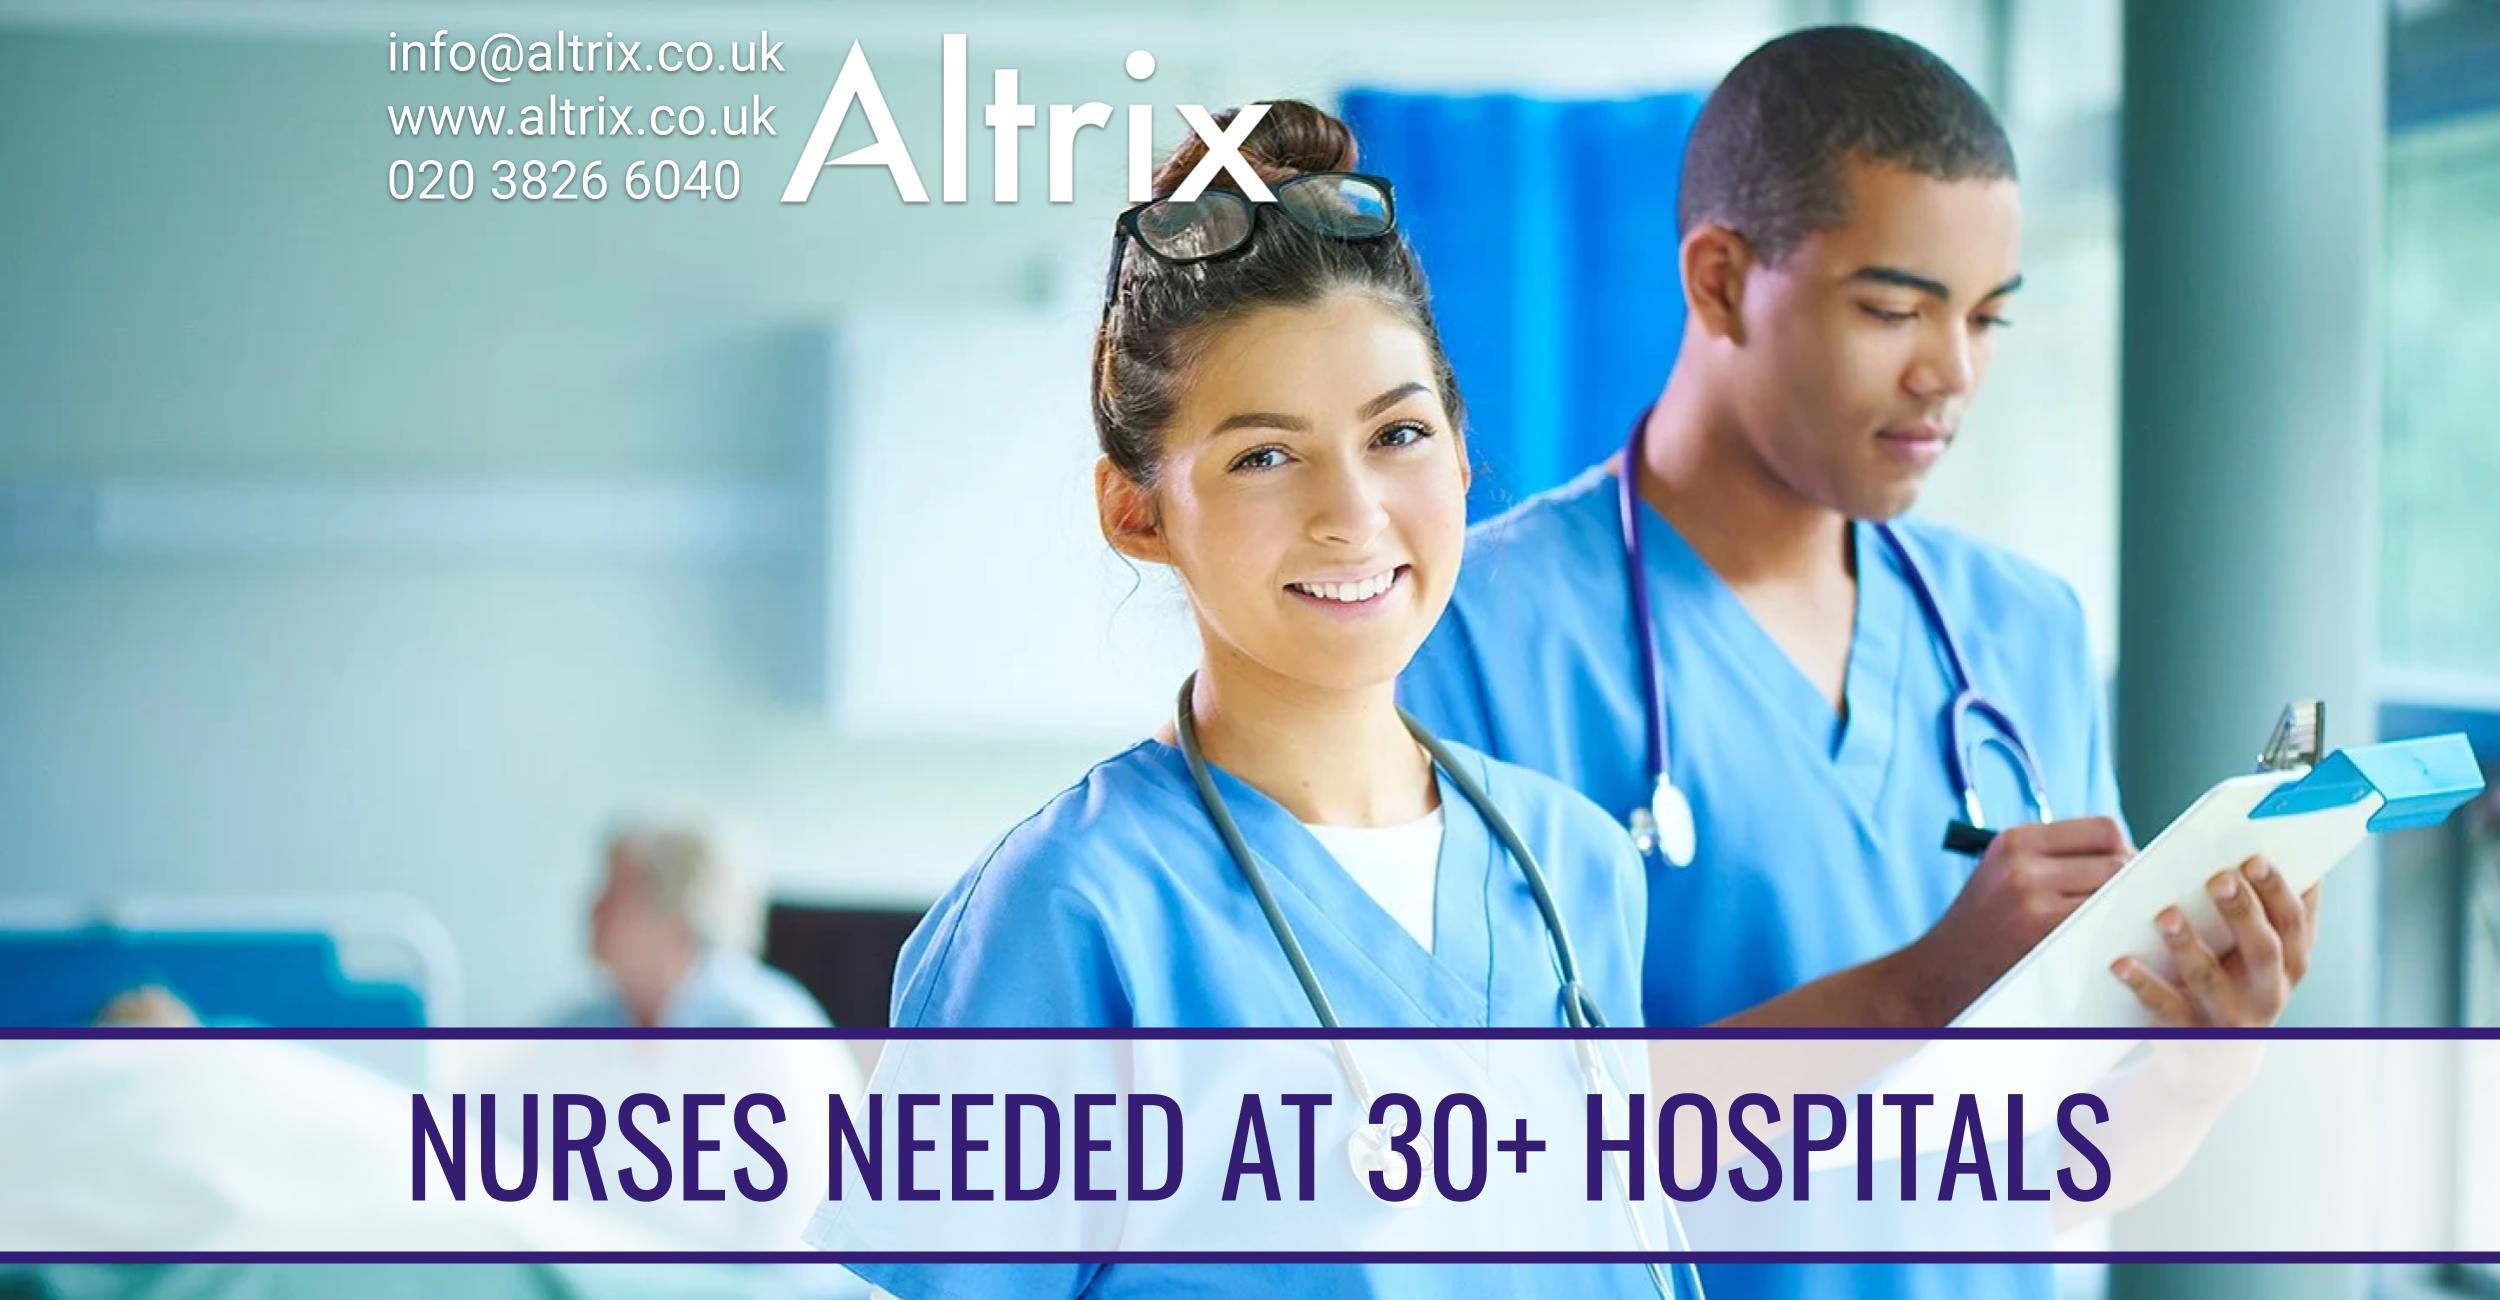 altrix needs nusres at 30+ hospitals across the uk